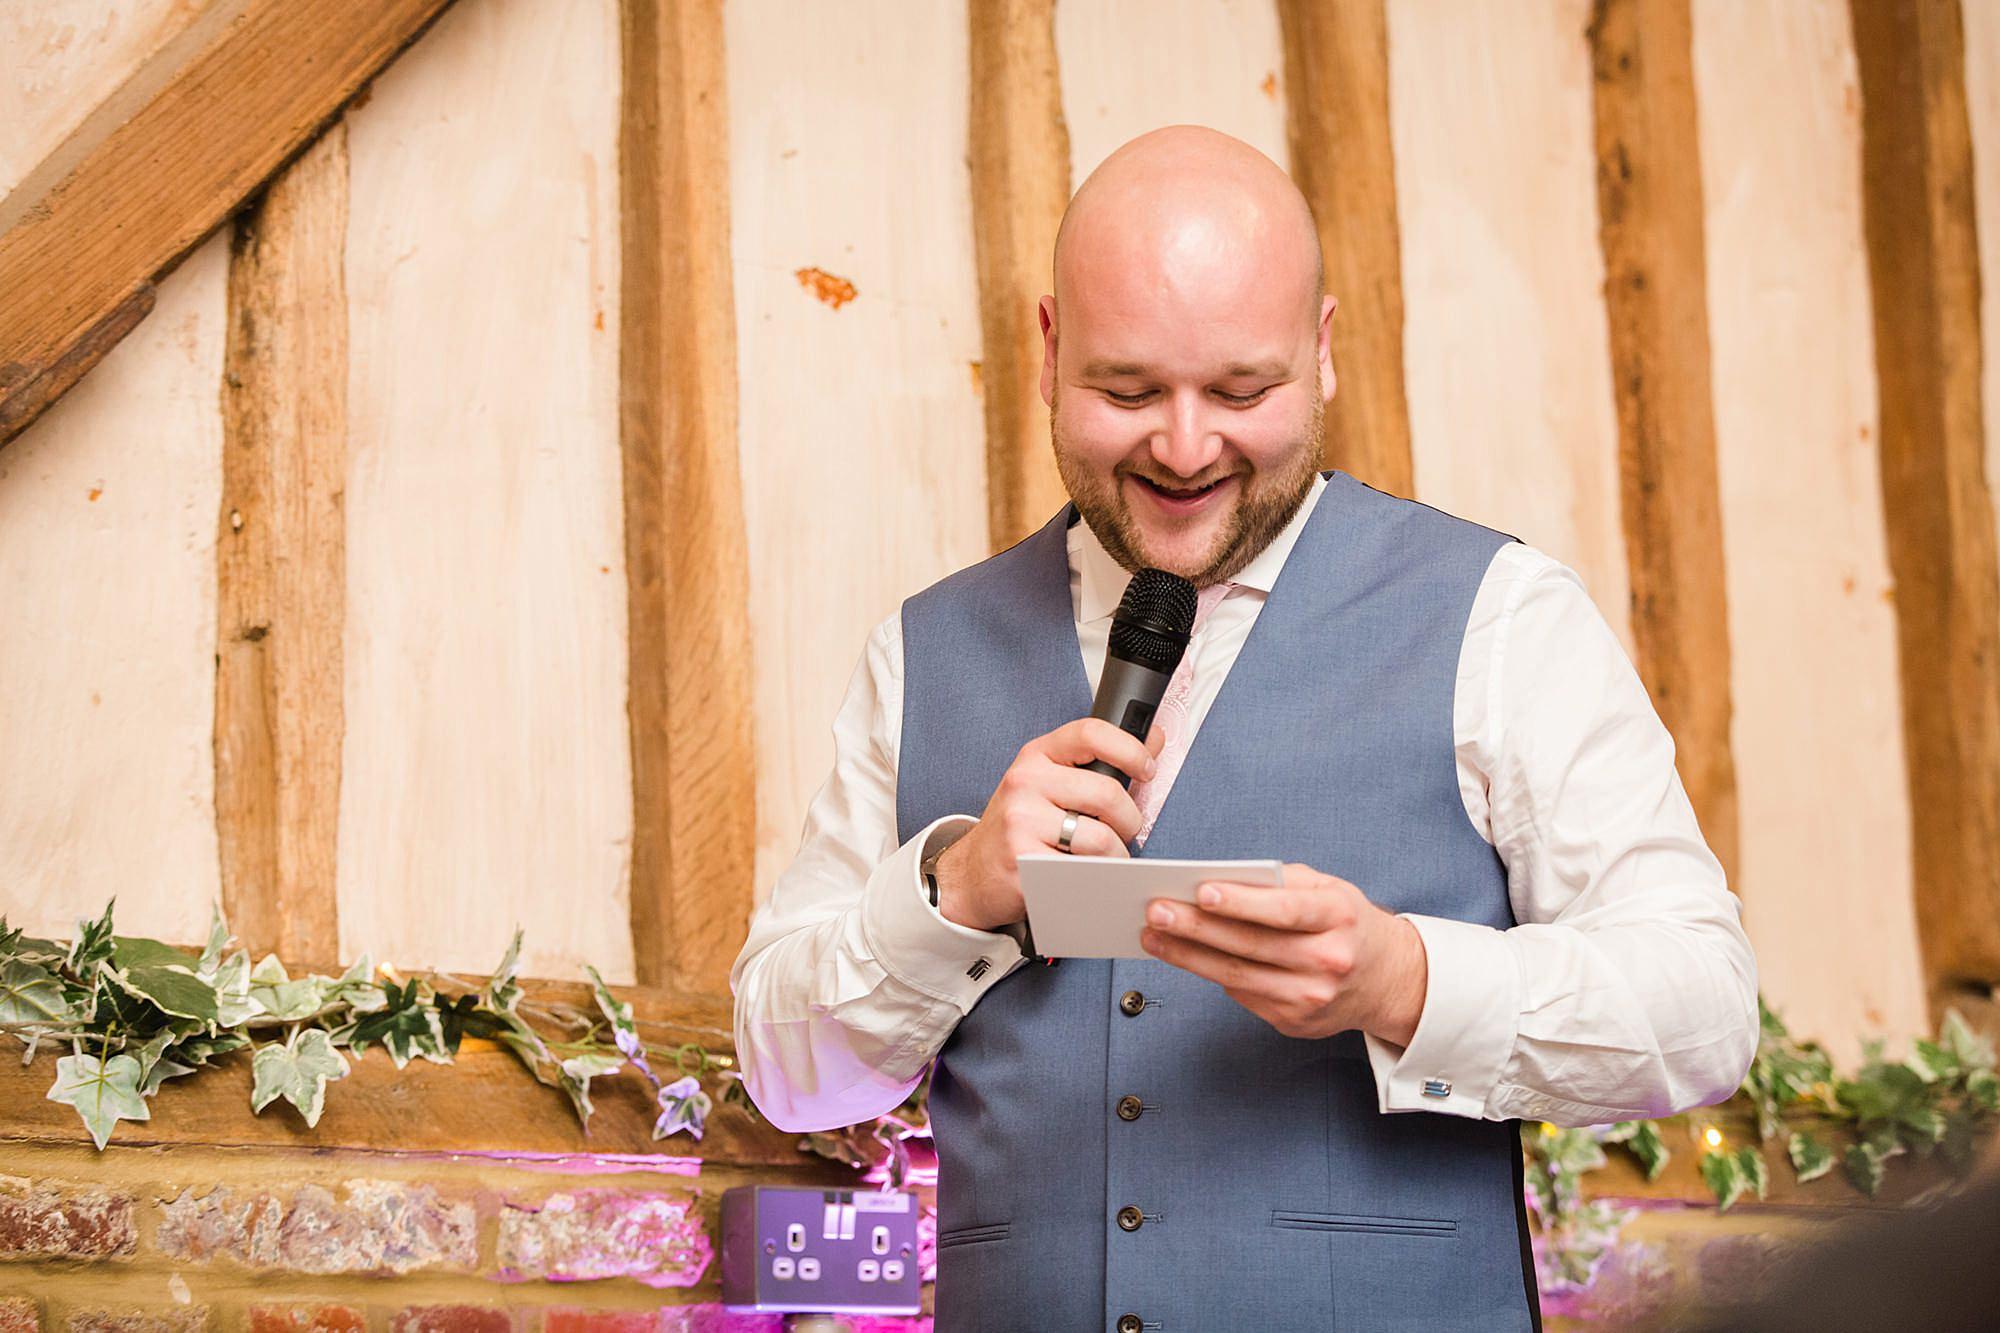 Lillibrooke Manor wedding best man giving speech